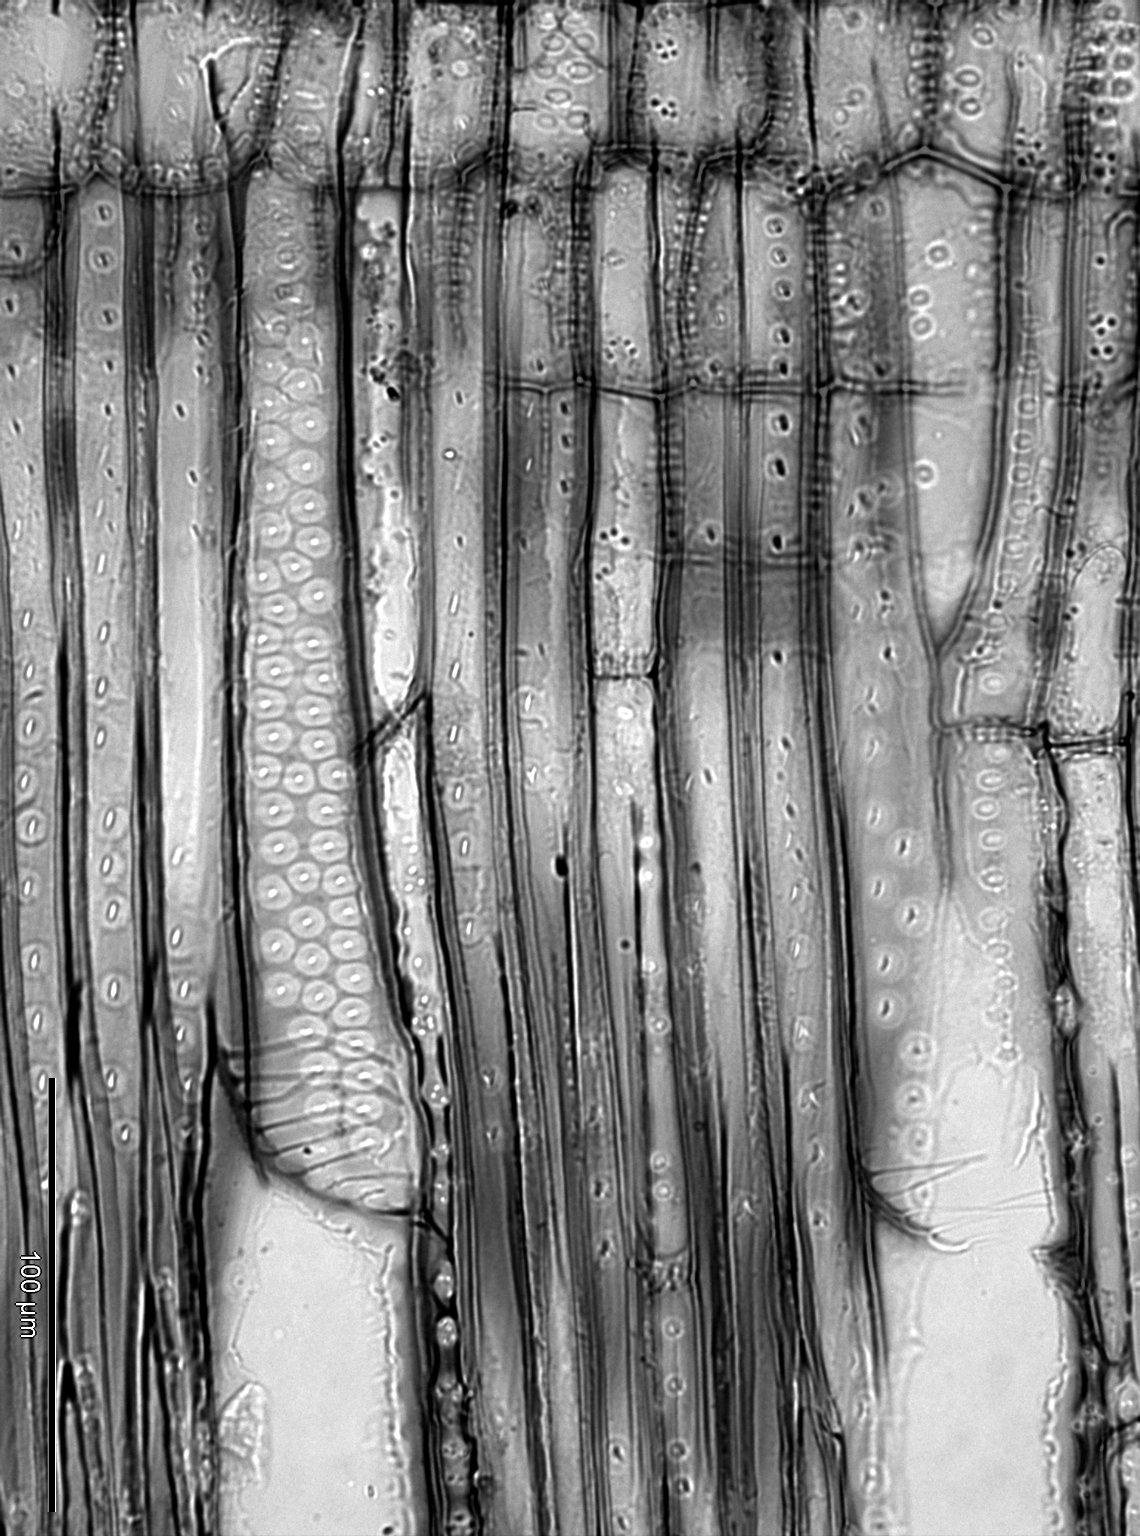 STAPHYLEACEAE Staphylea trifoliata